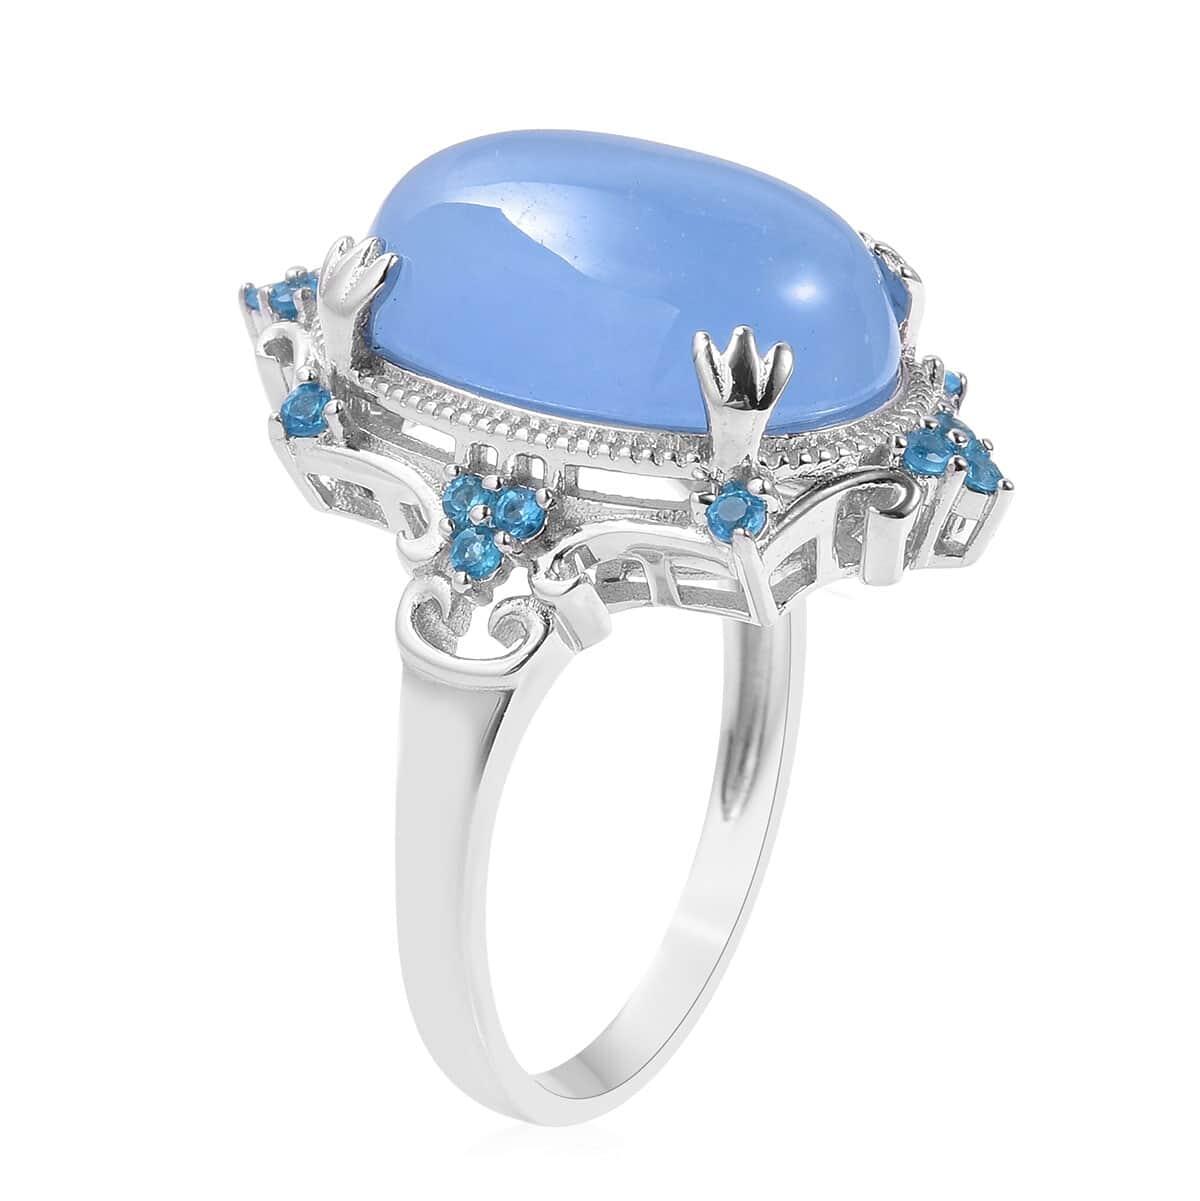 Burmese Blue Jade, Malgache Neon Apatite Ring in Sterling Silver (Size 8.0) 14.65 ctw